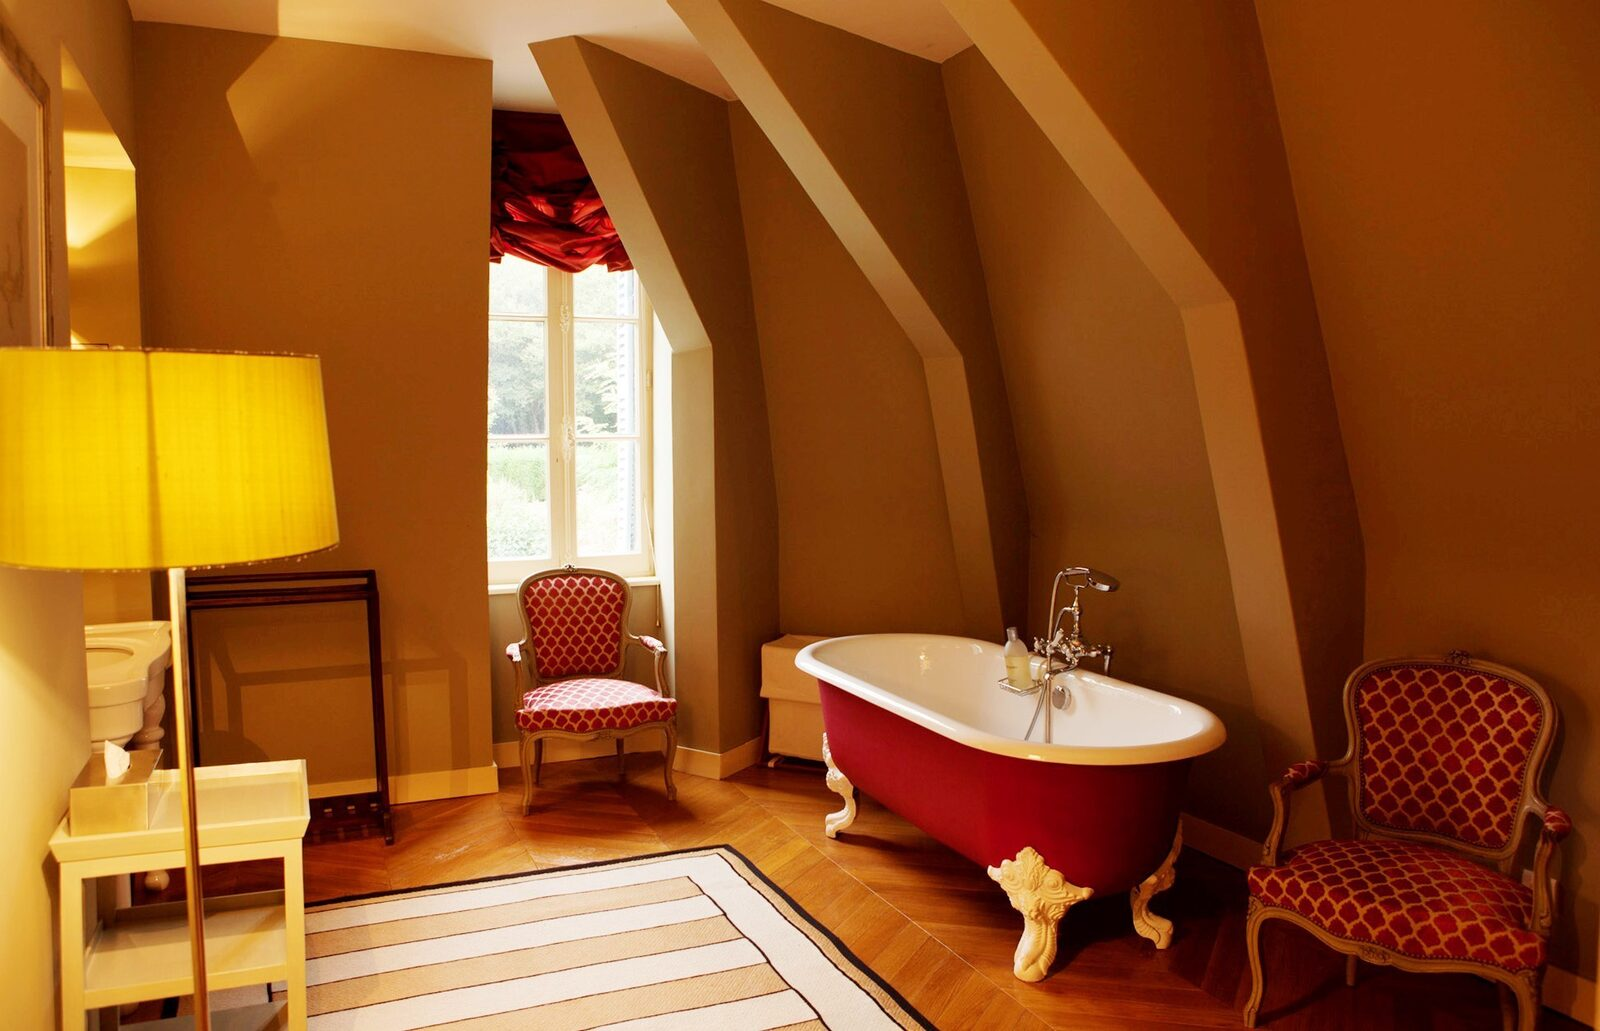 Domaine de Châteaufort - Luxe kasteelvakantie Loiredal